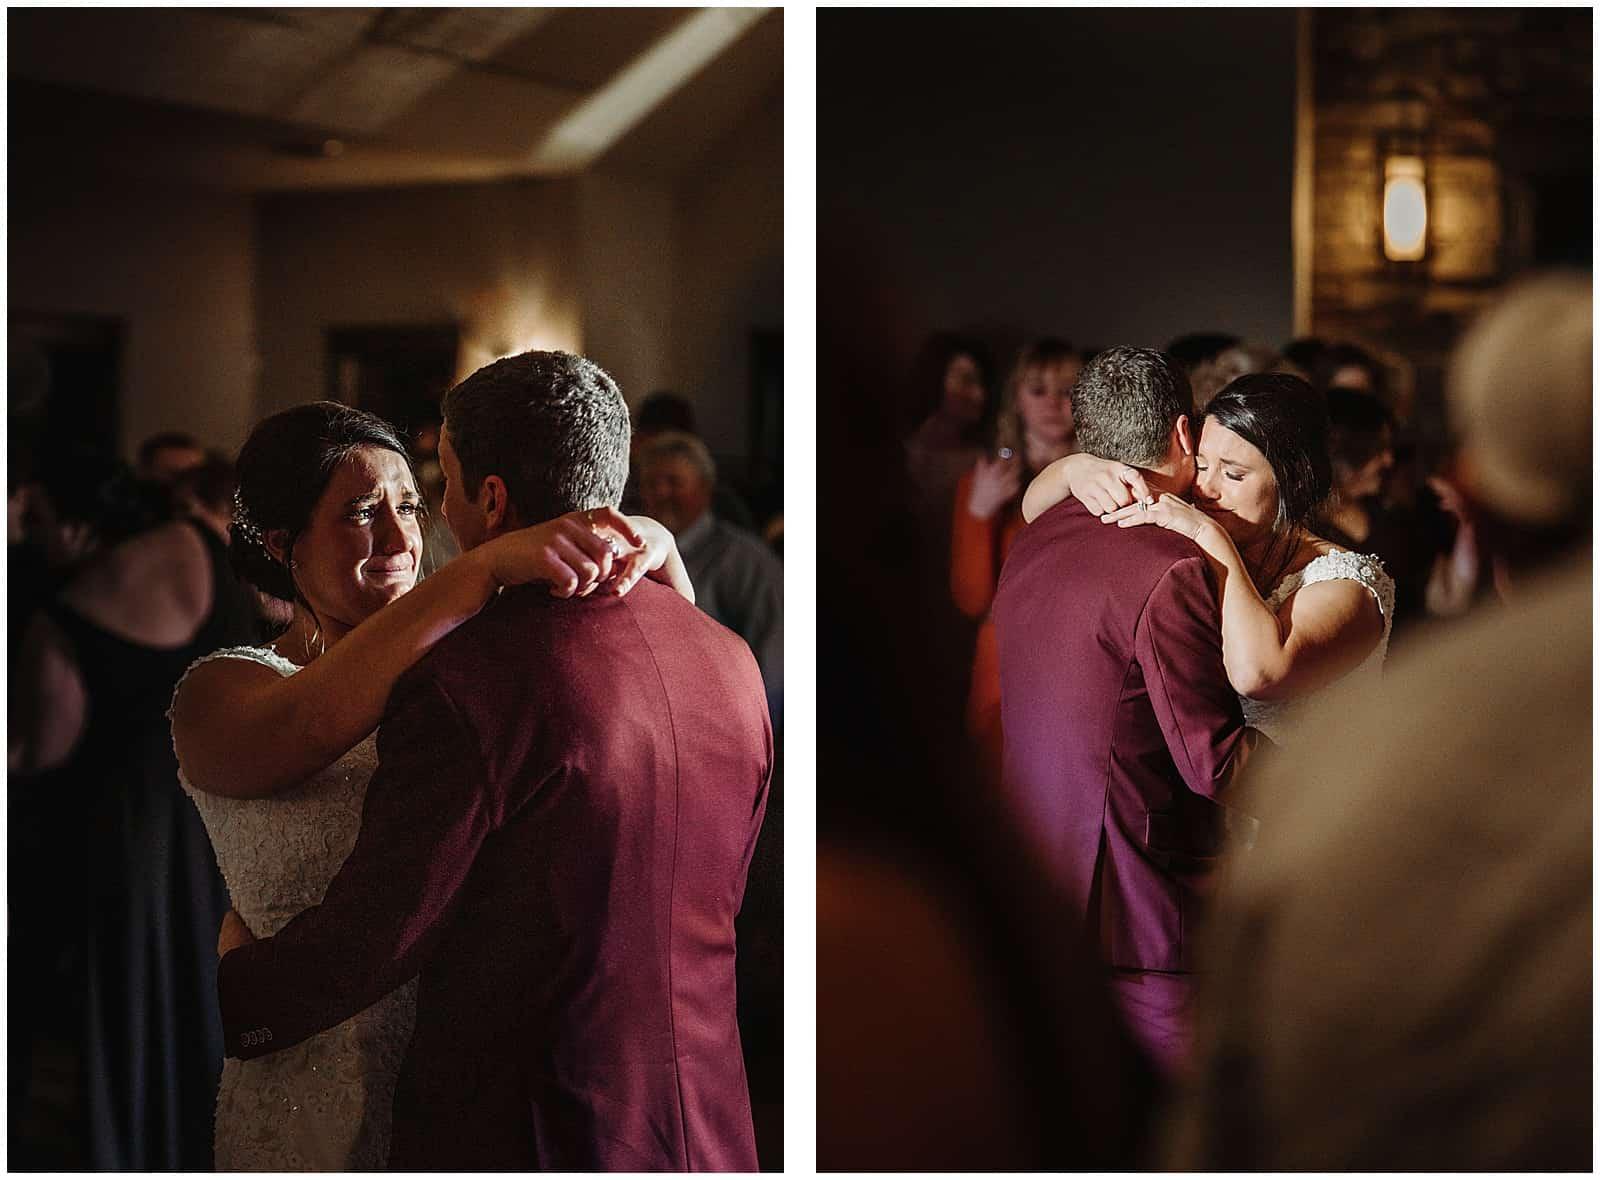 wedding shot at hidden greens in Hastings, Minnesota